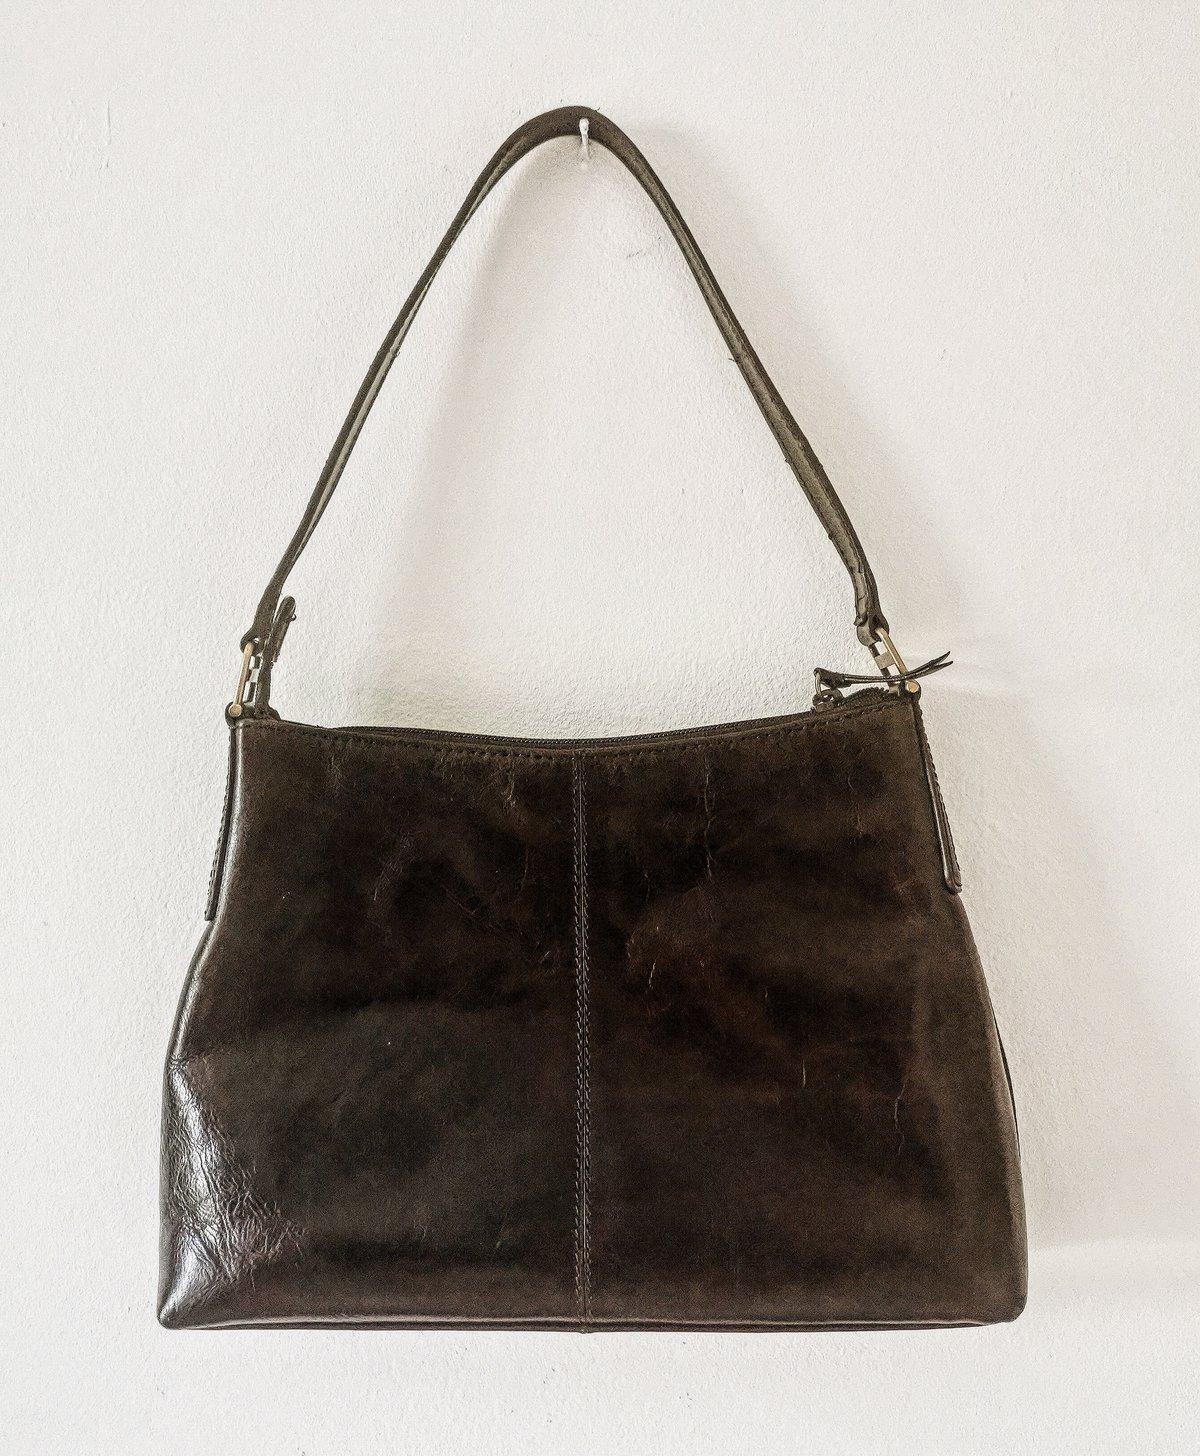 Image of brown bag